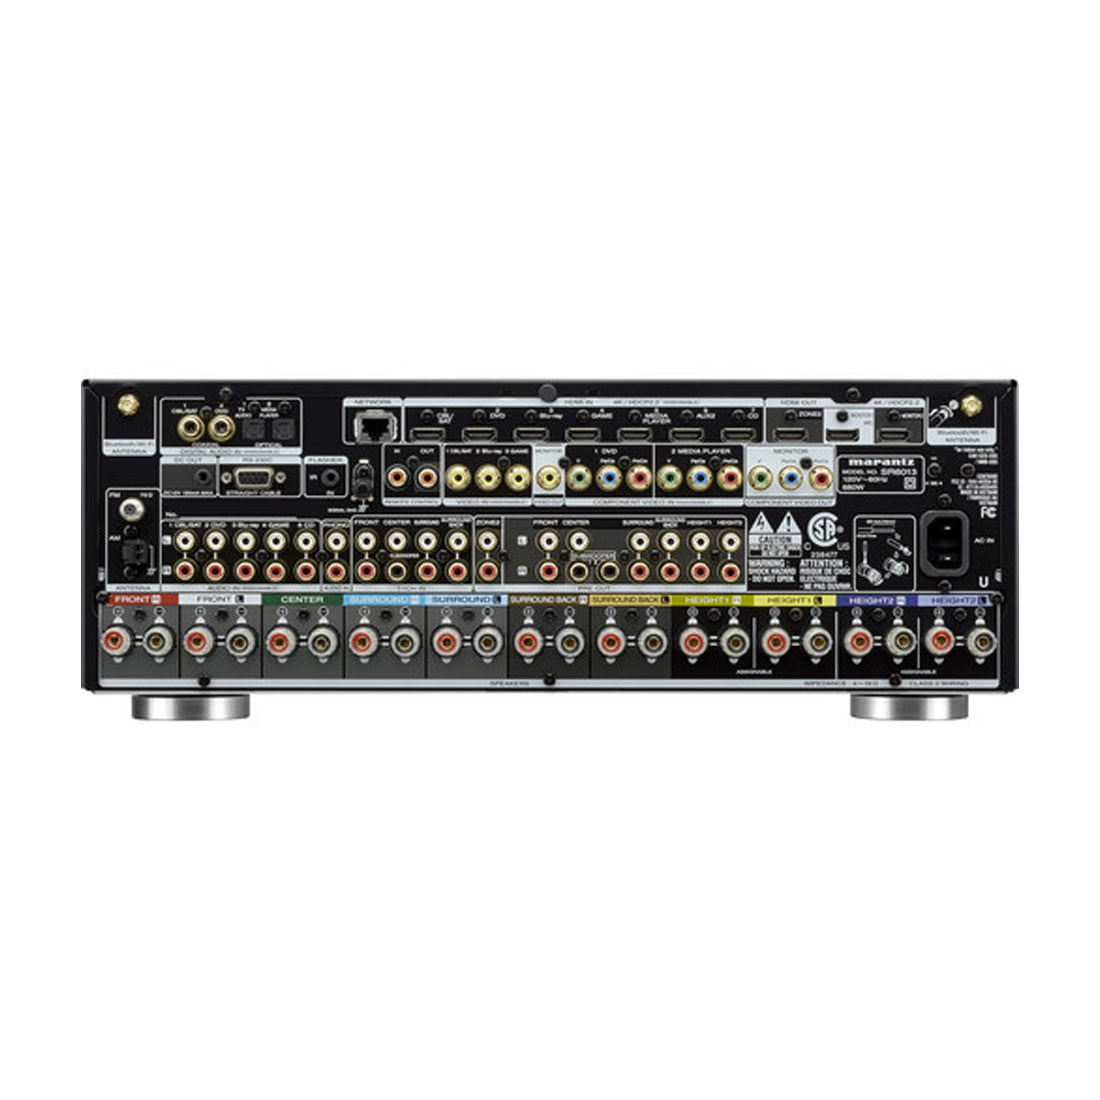 Marantz SR6013 B-Stock 9.2-Ch. Network A/V Receiver